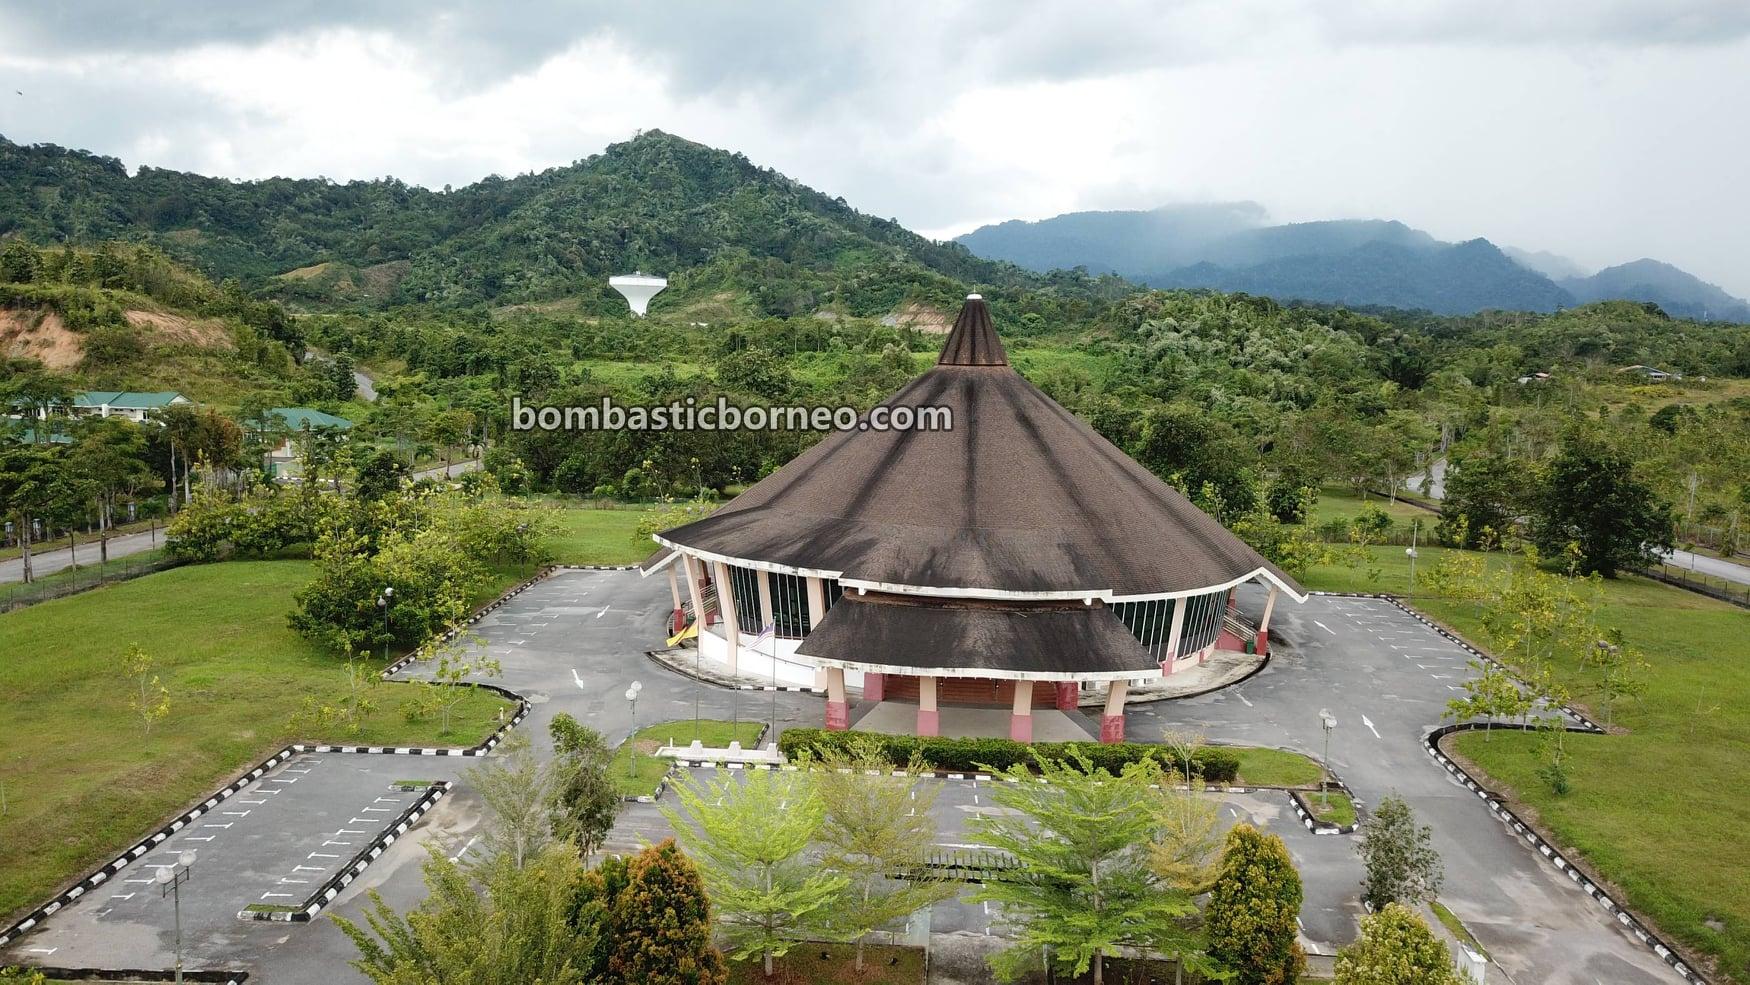 KLB Garden, holiday, backpackers, destination, exploration, objek wisata, Tourism, travel locally, Trans Border, Borneo, 穿越婆罗洲游踪, 马来西亚砂拉越, 西连打必律旅游景点